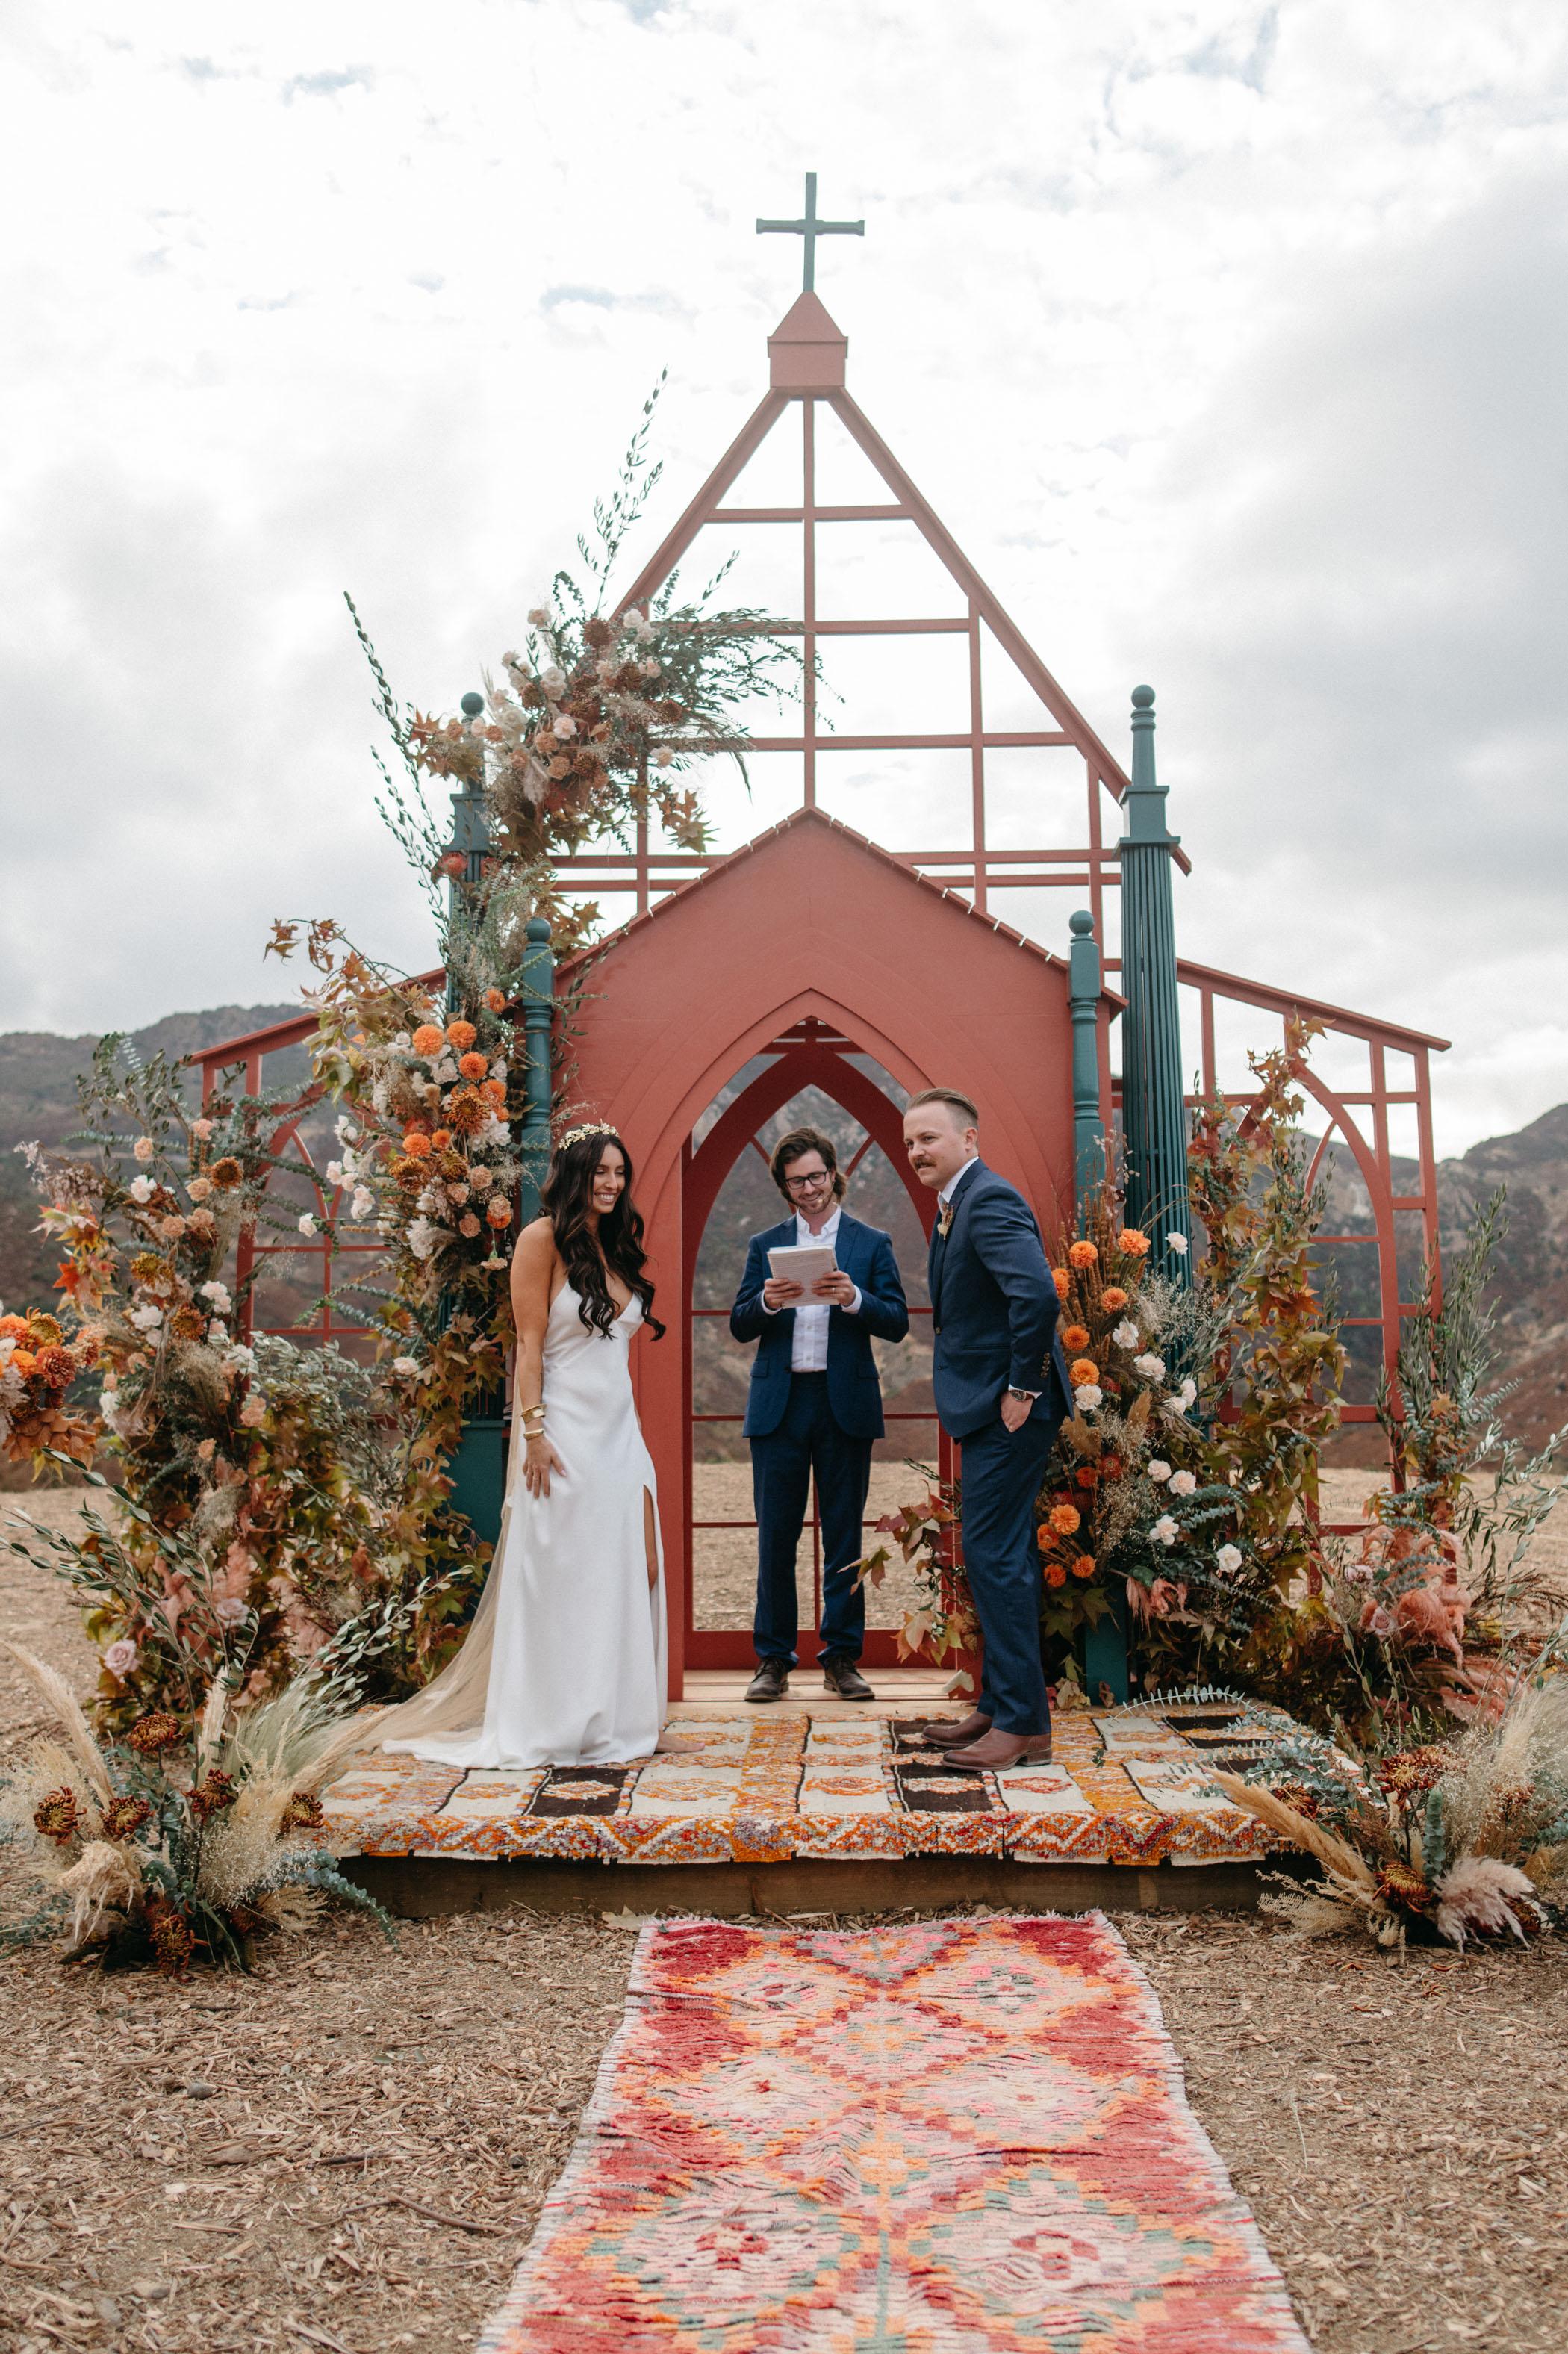 outdoor wedding backdrop steal chapel Mulholland